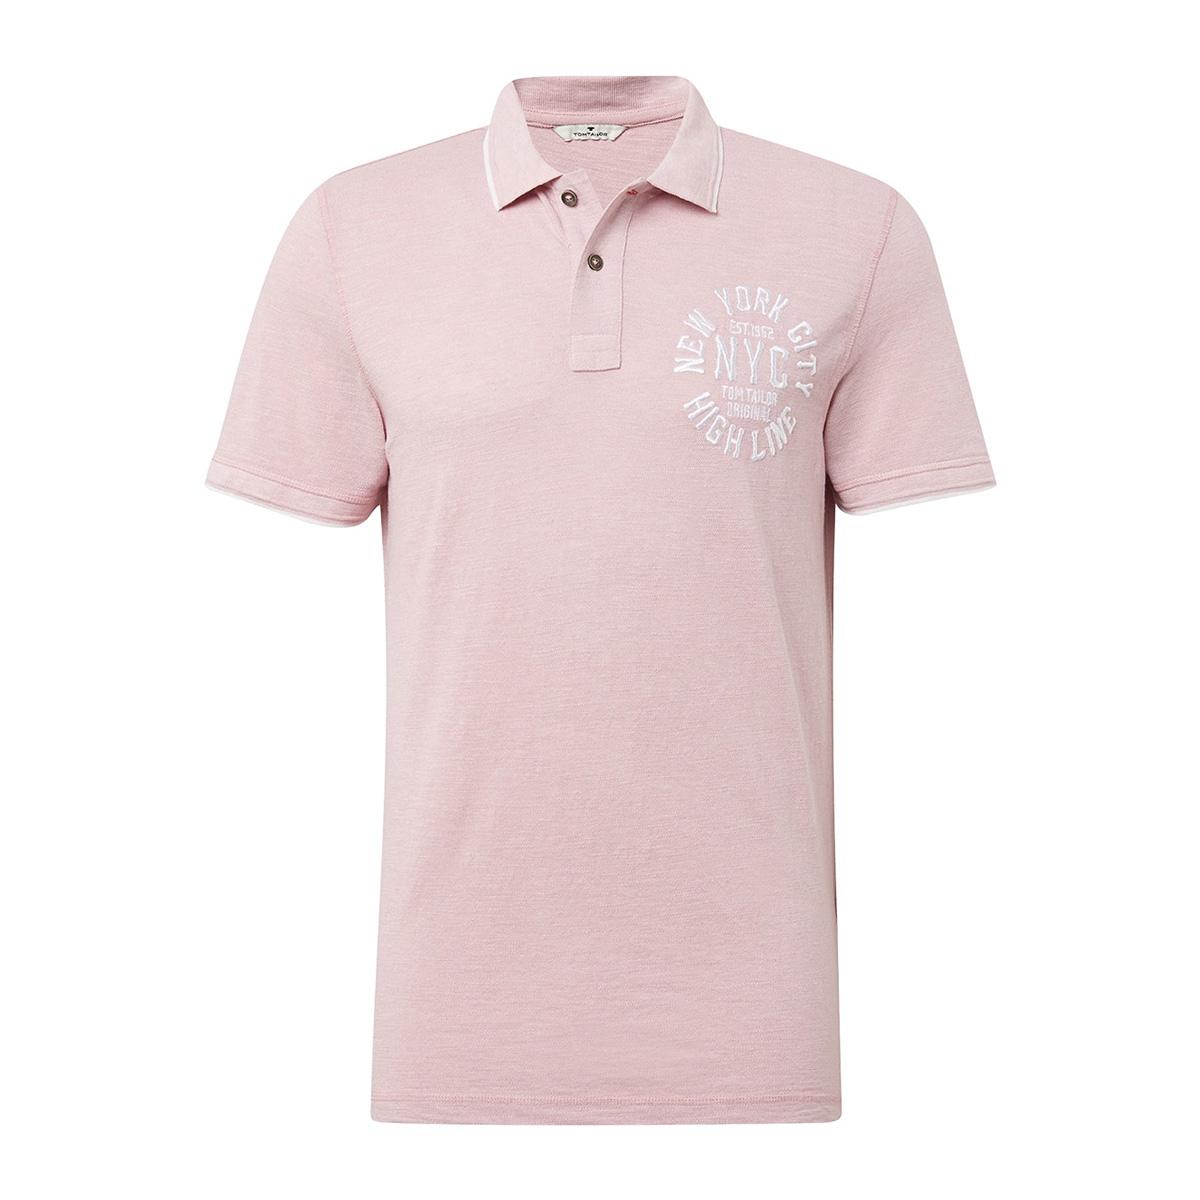 1009962xx10 tom tailor polo 17016